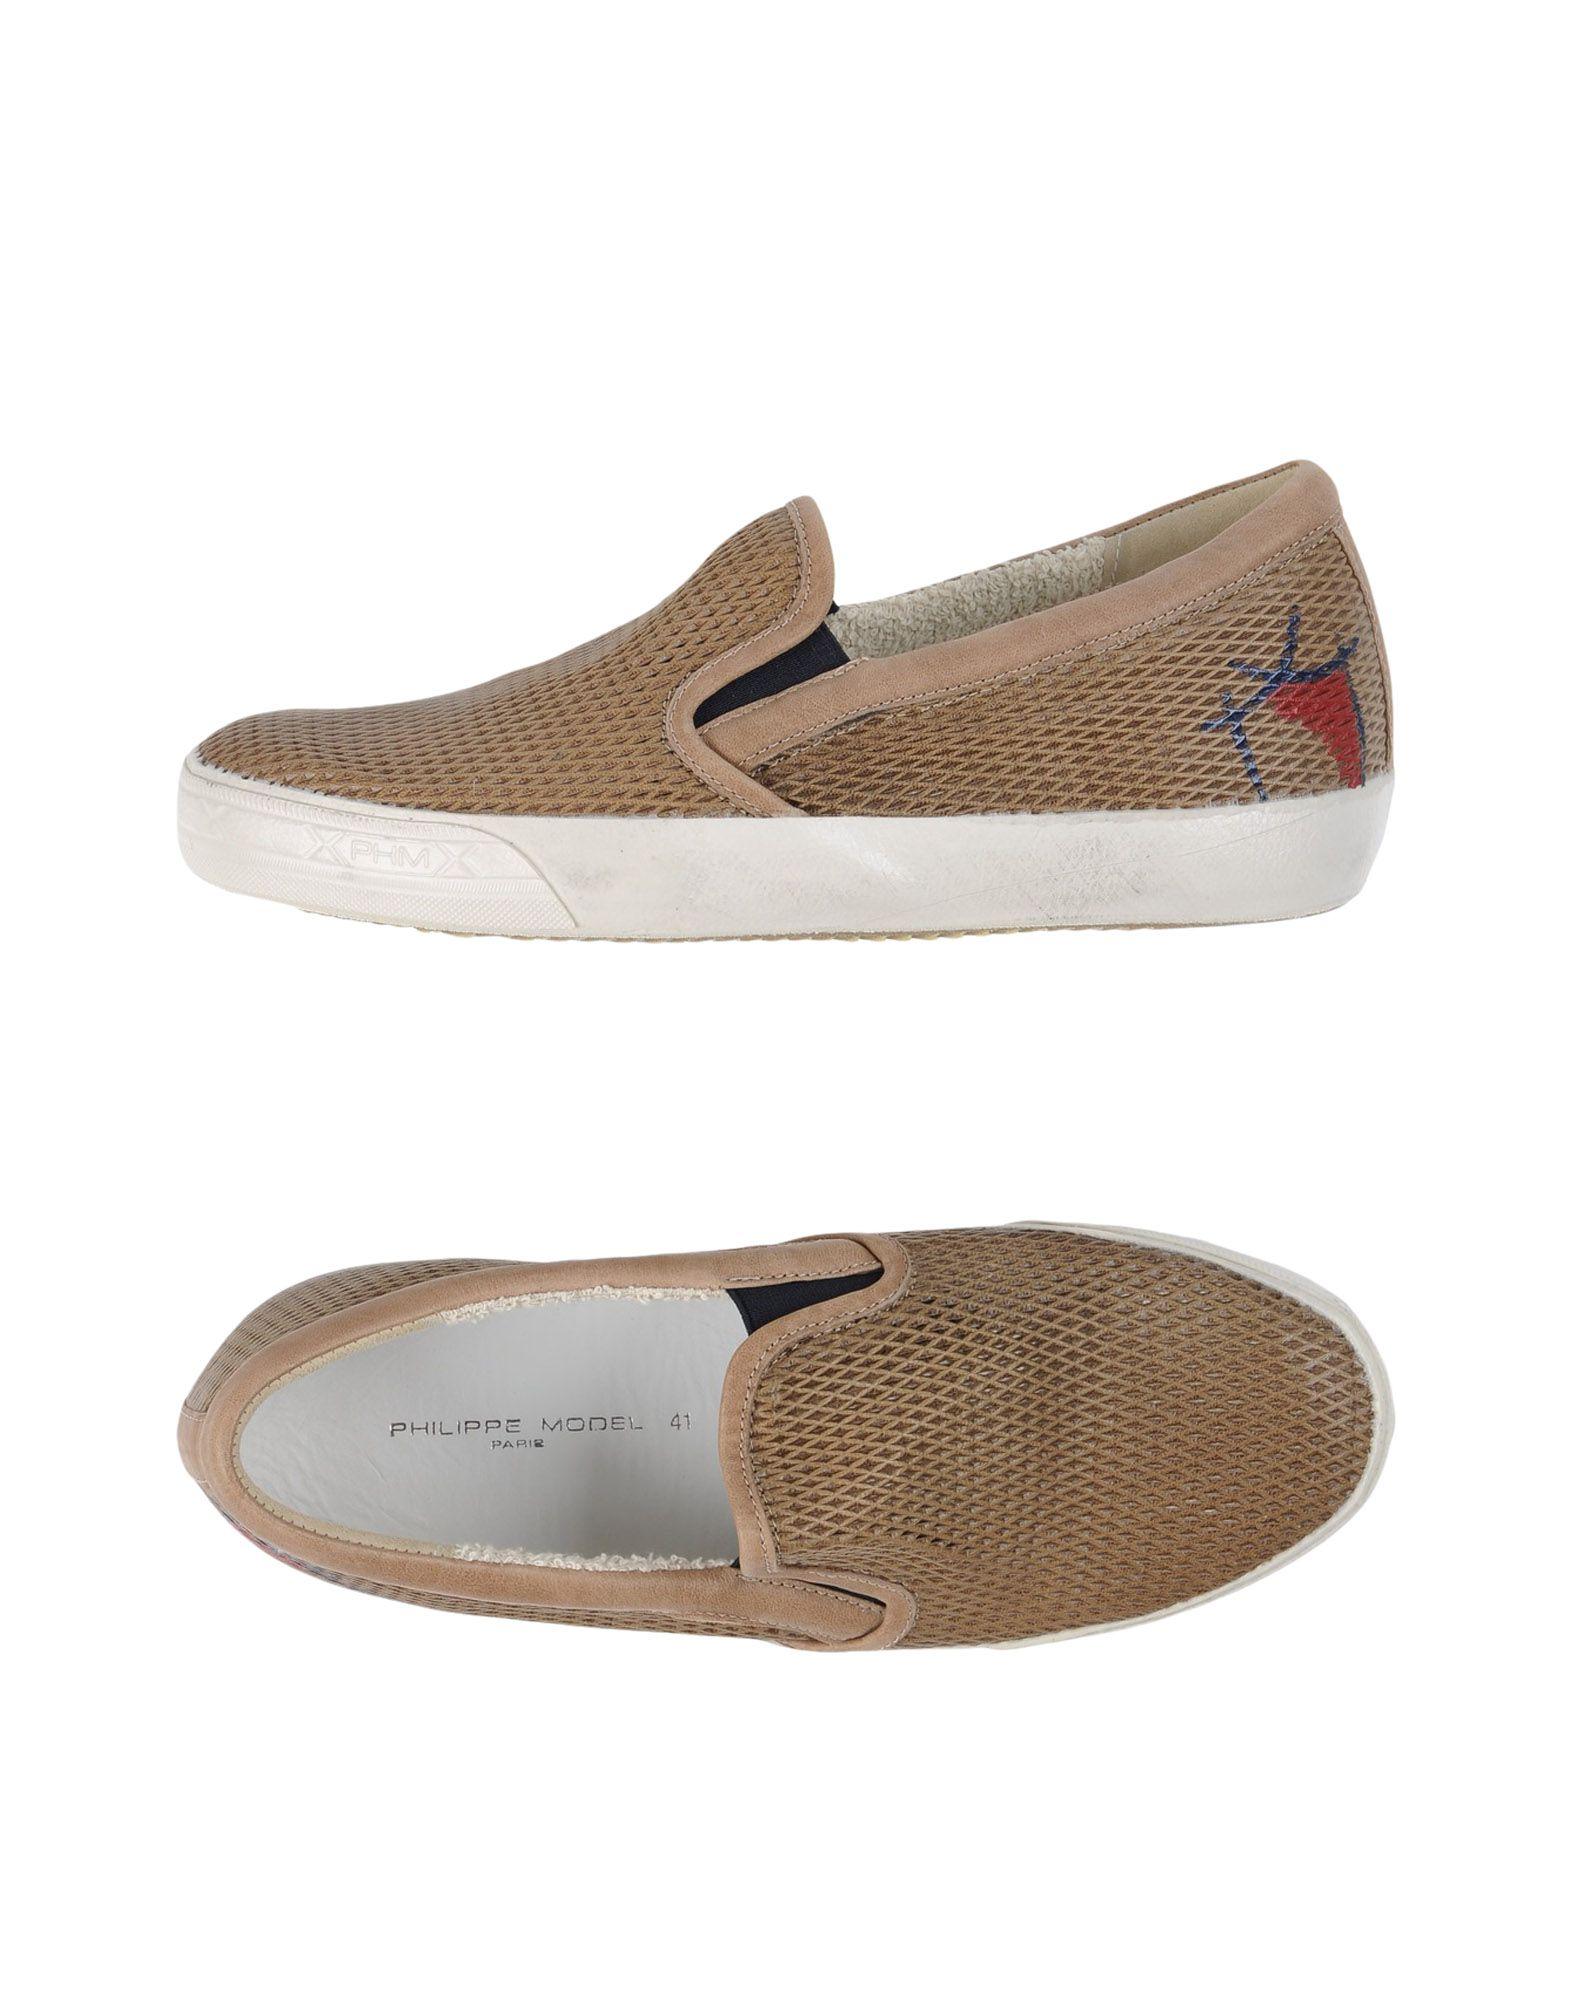 PHILIPPE MODEL Herren Low Sneakers & Tennisschuhe Farbe Khaki Größe 9 jetztbilligerkaufen